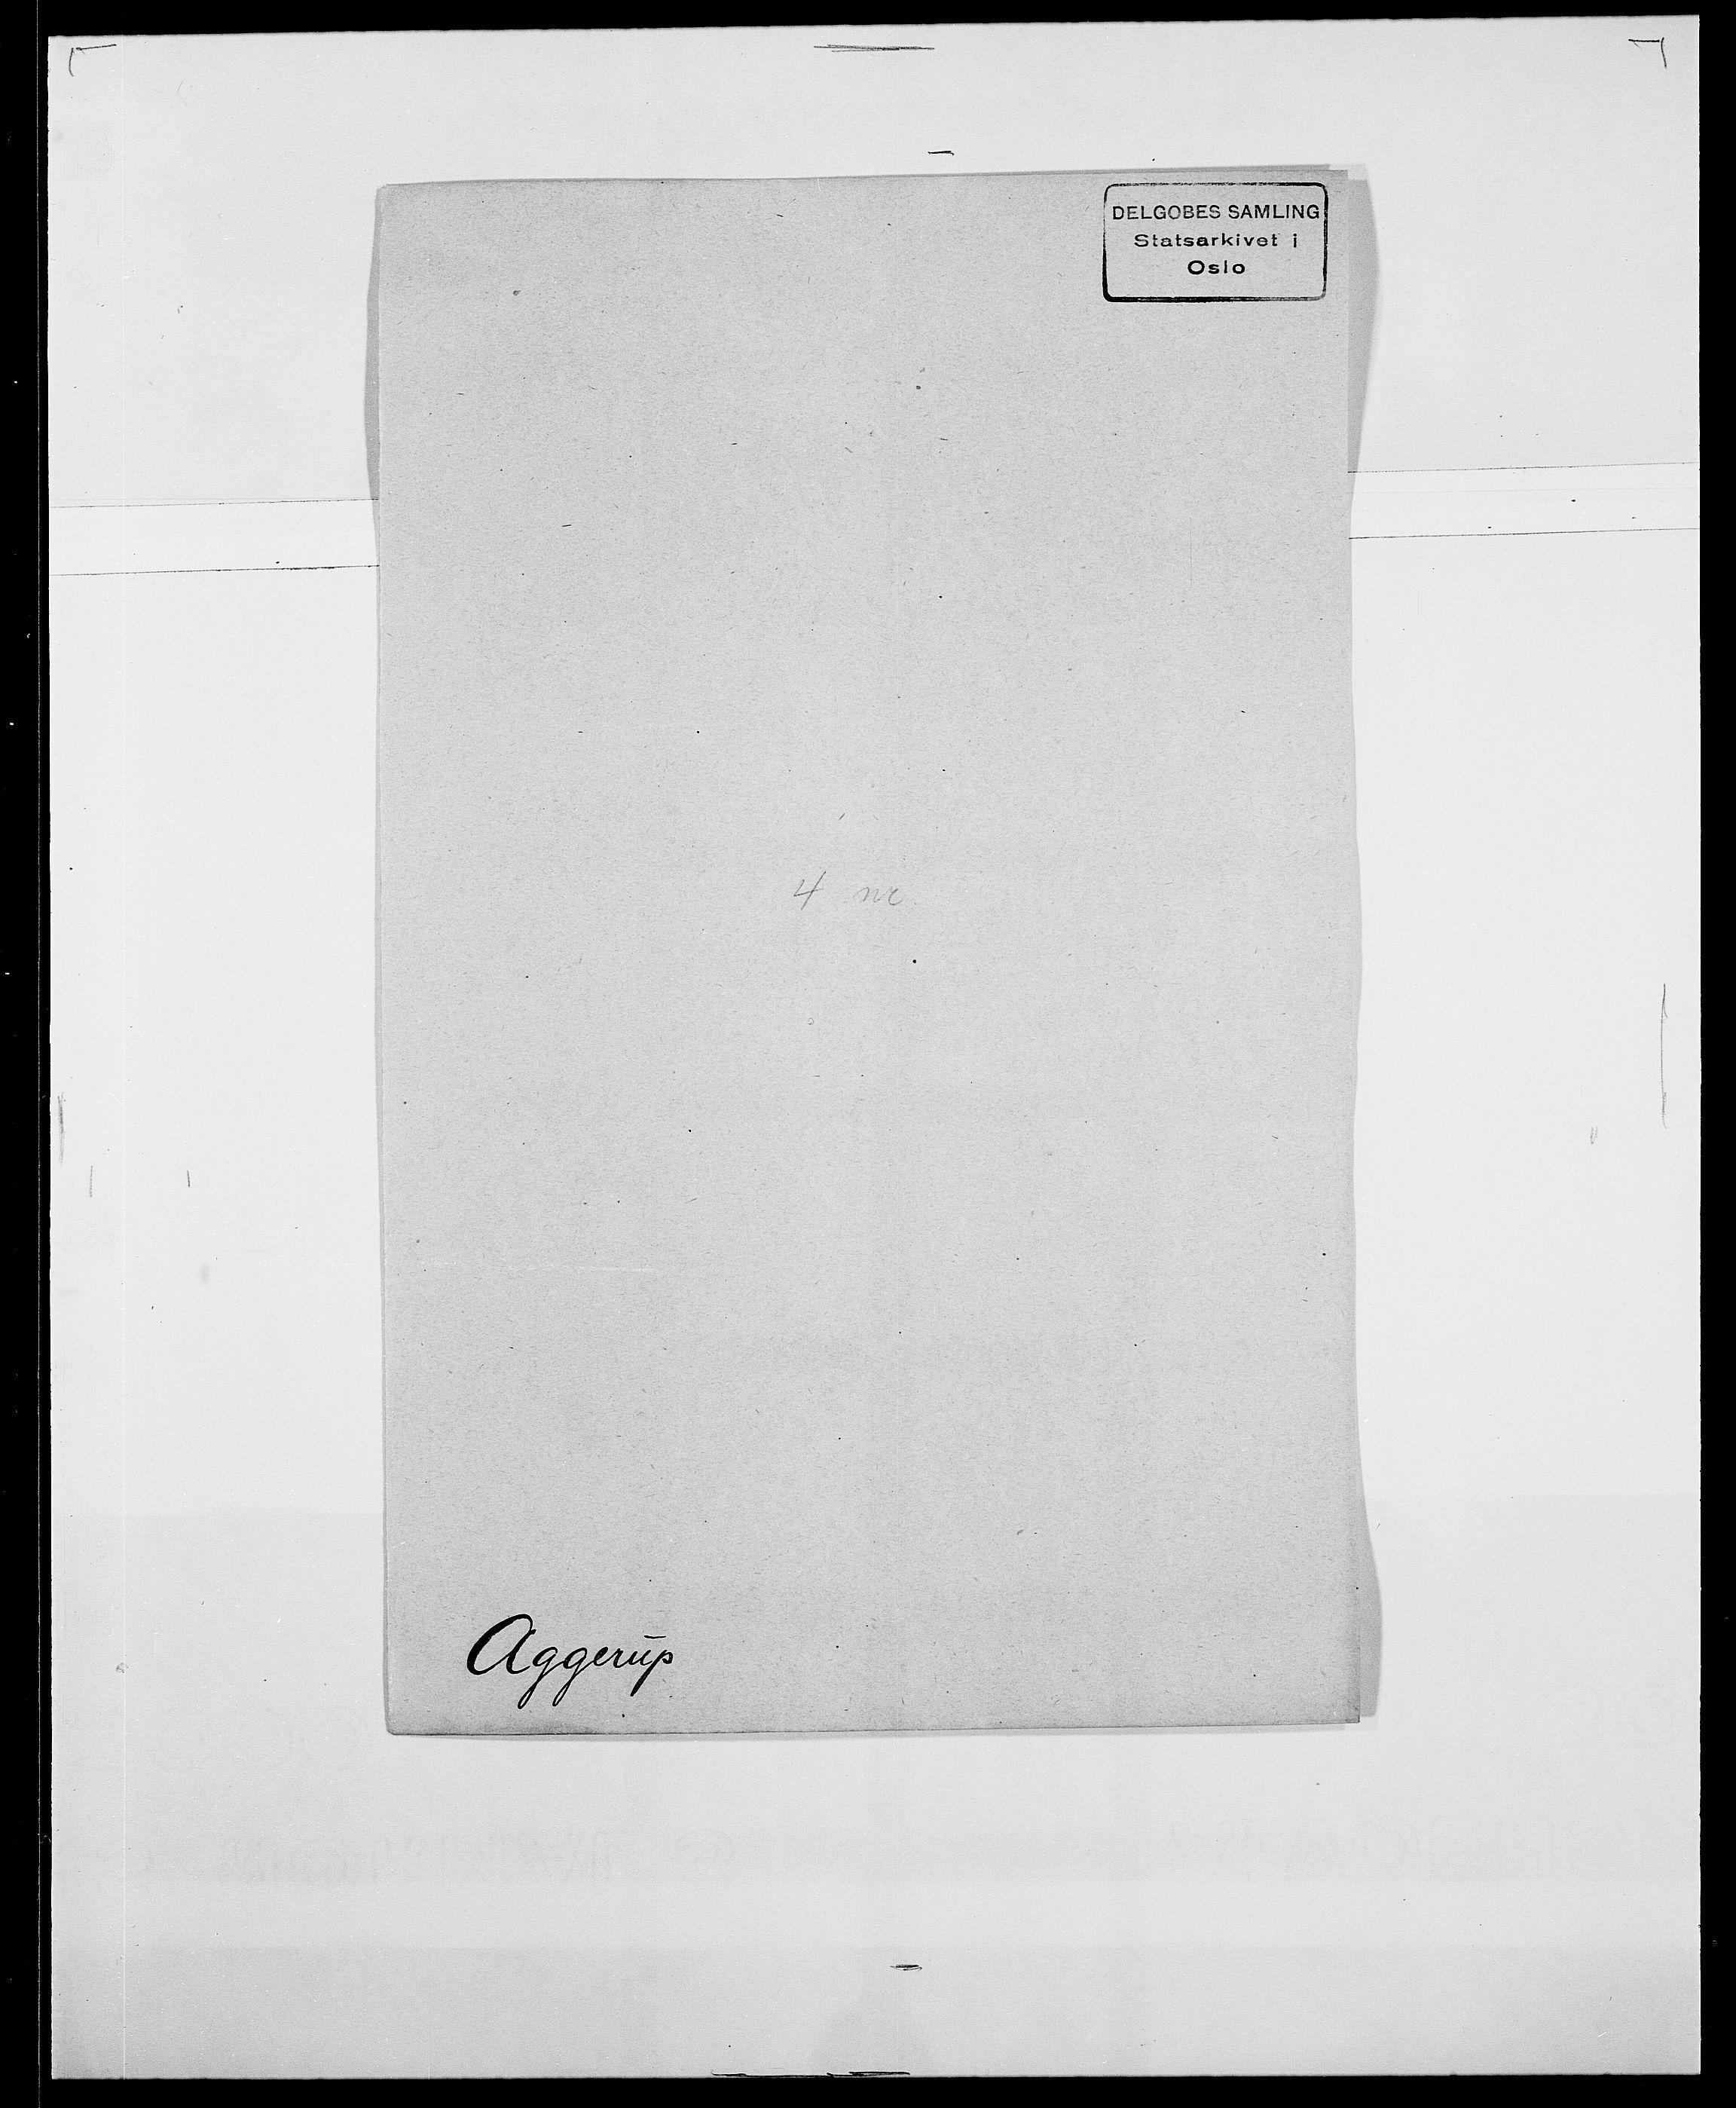 SAO, Delgobe, Charles Antoine - samling, D/Da/L0001: Aabye - Angerman, s. 303